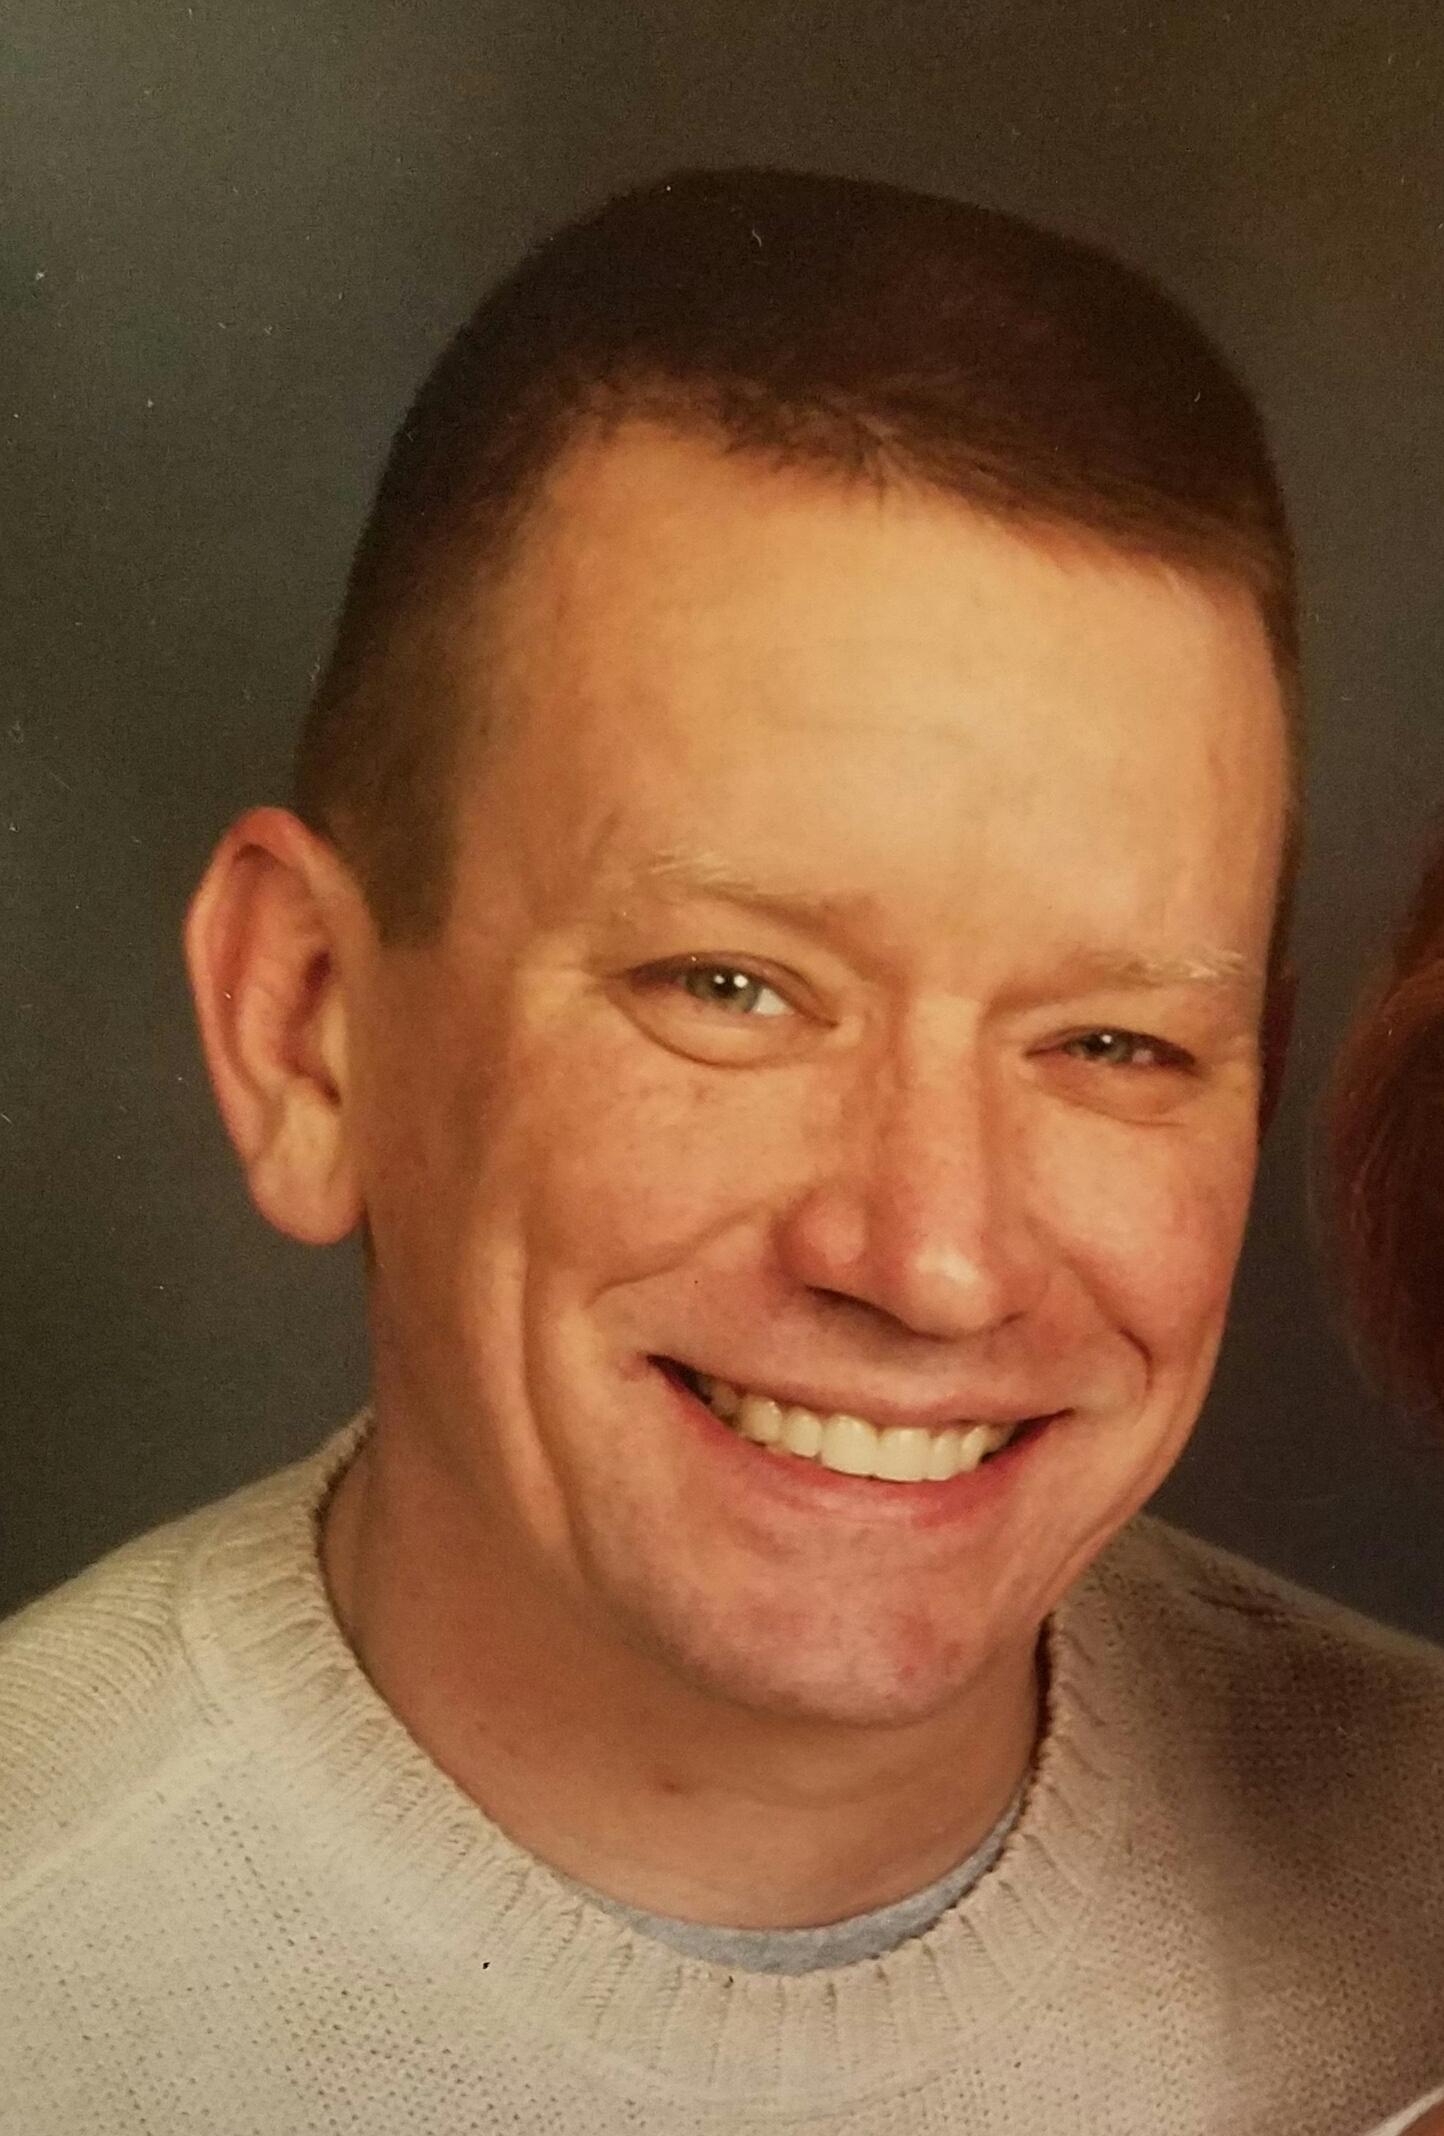 SFC John Andrew Feher